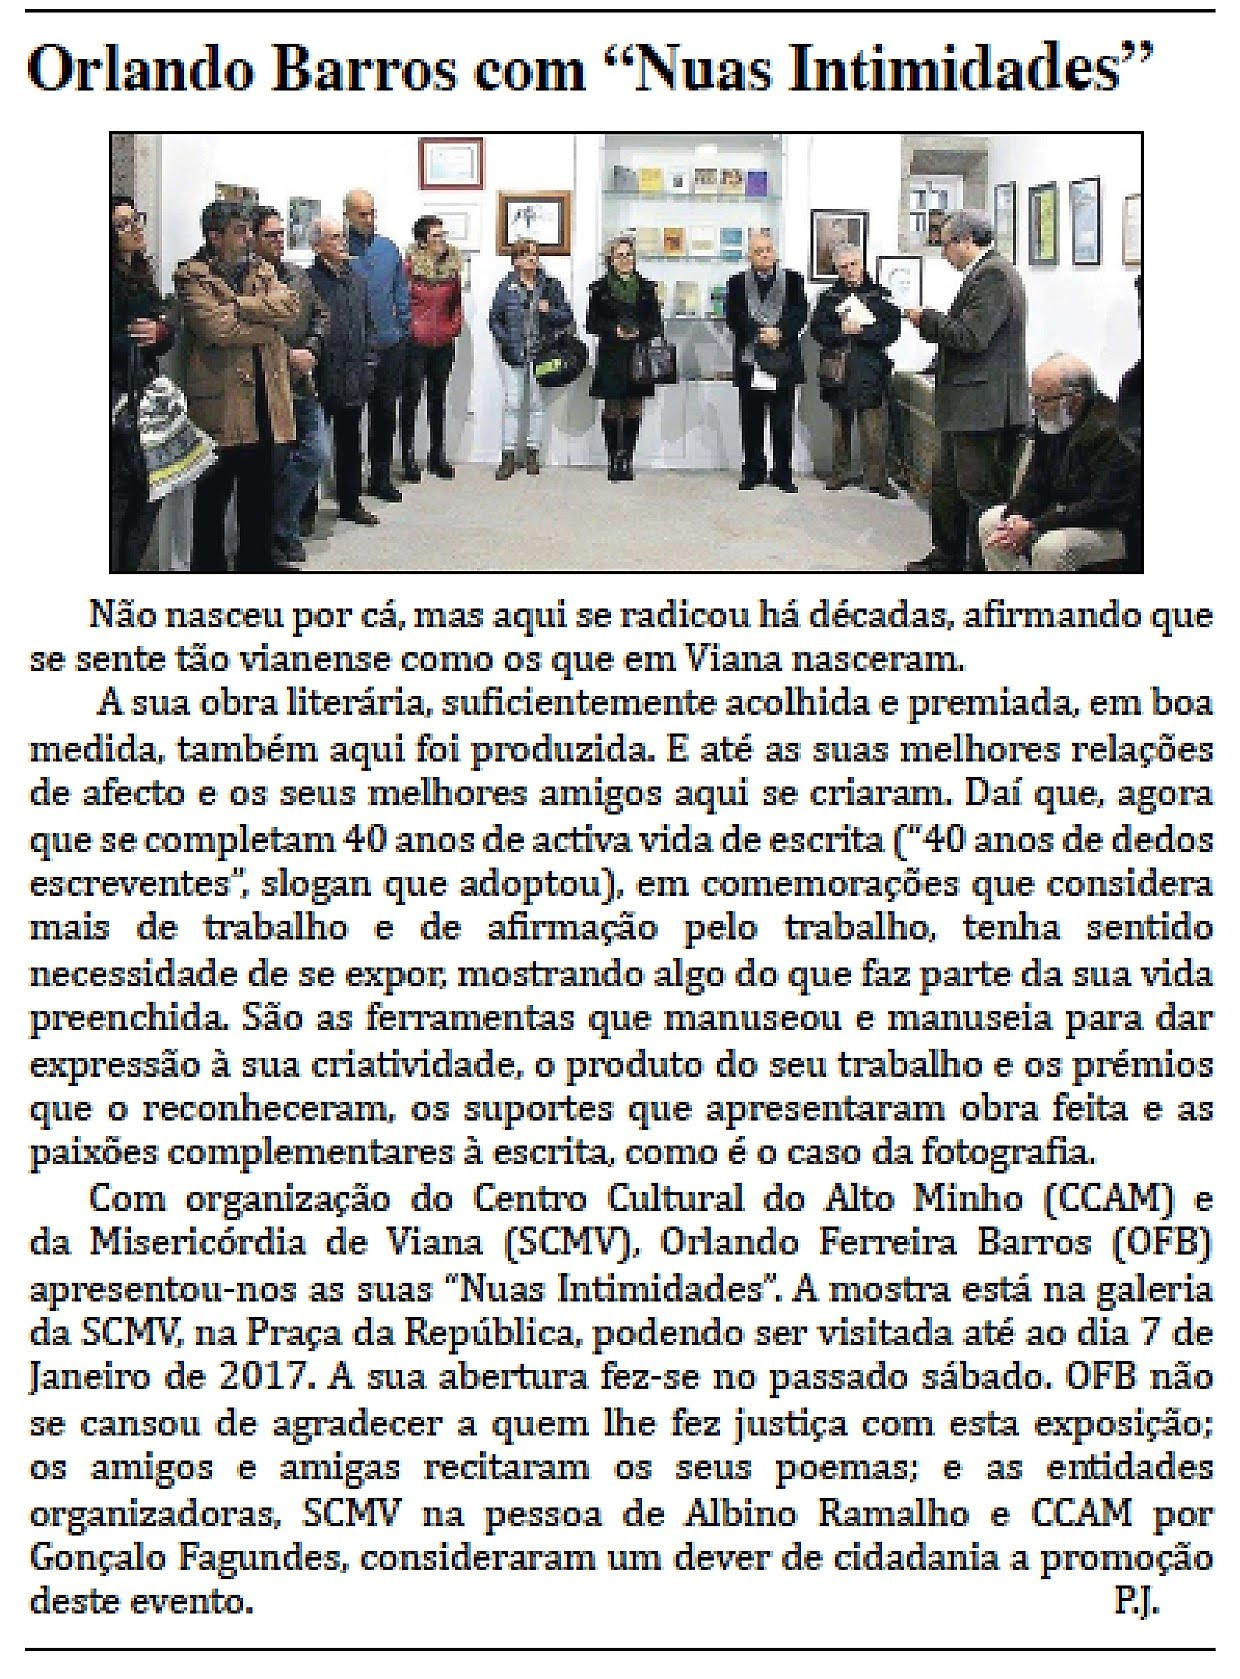 https://sites.google.com/a/centroculturaldoaltominho.org/ccam/actividades-realizadas/2017/realizacoes-actividades/_draft_post/NuasIntimidades.jpg